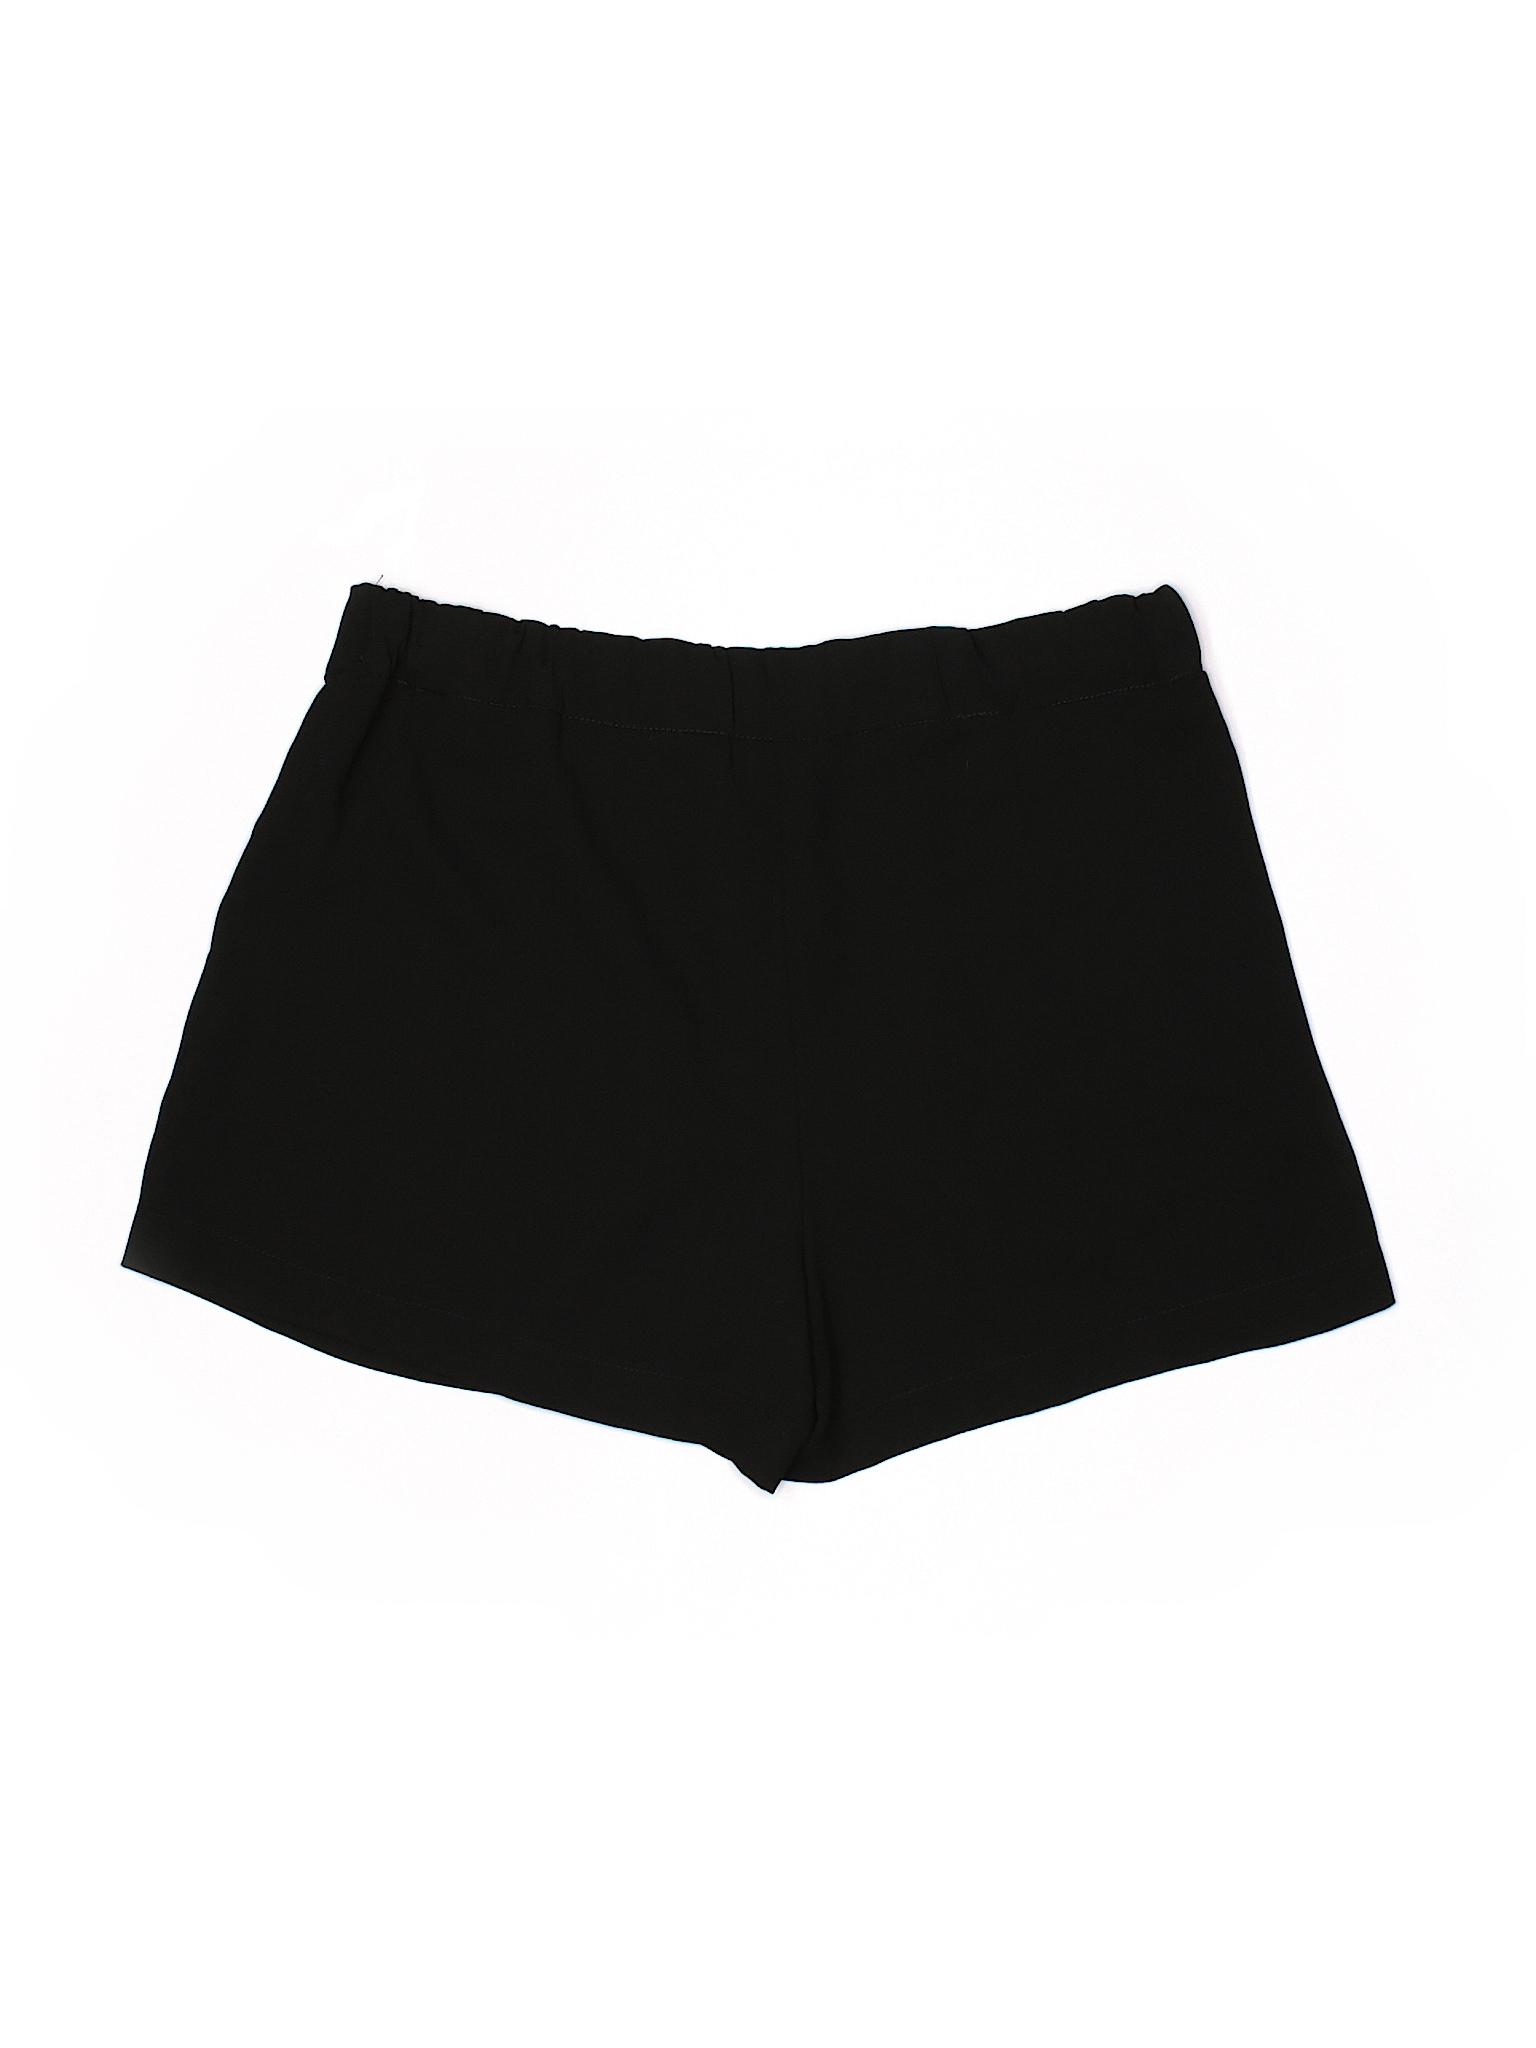 Boutique Shorts Nameless Boutique Boutique Shorts Nameless zwBq5HWg